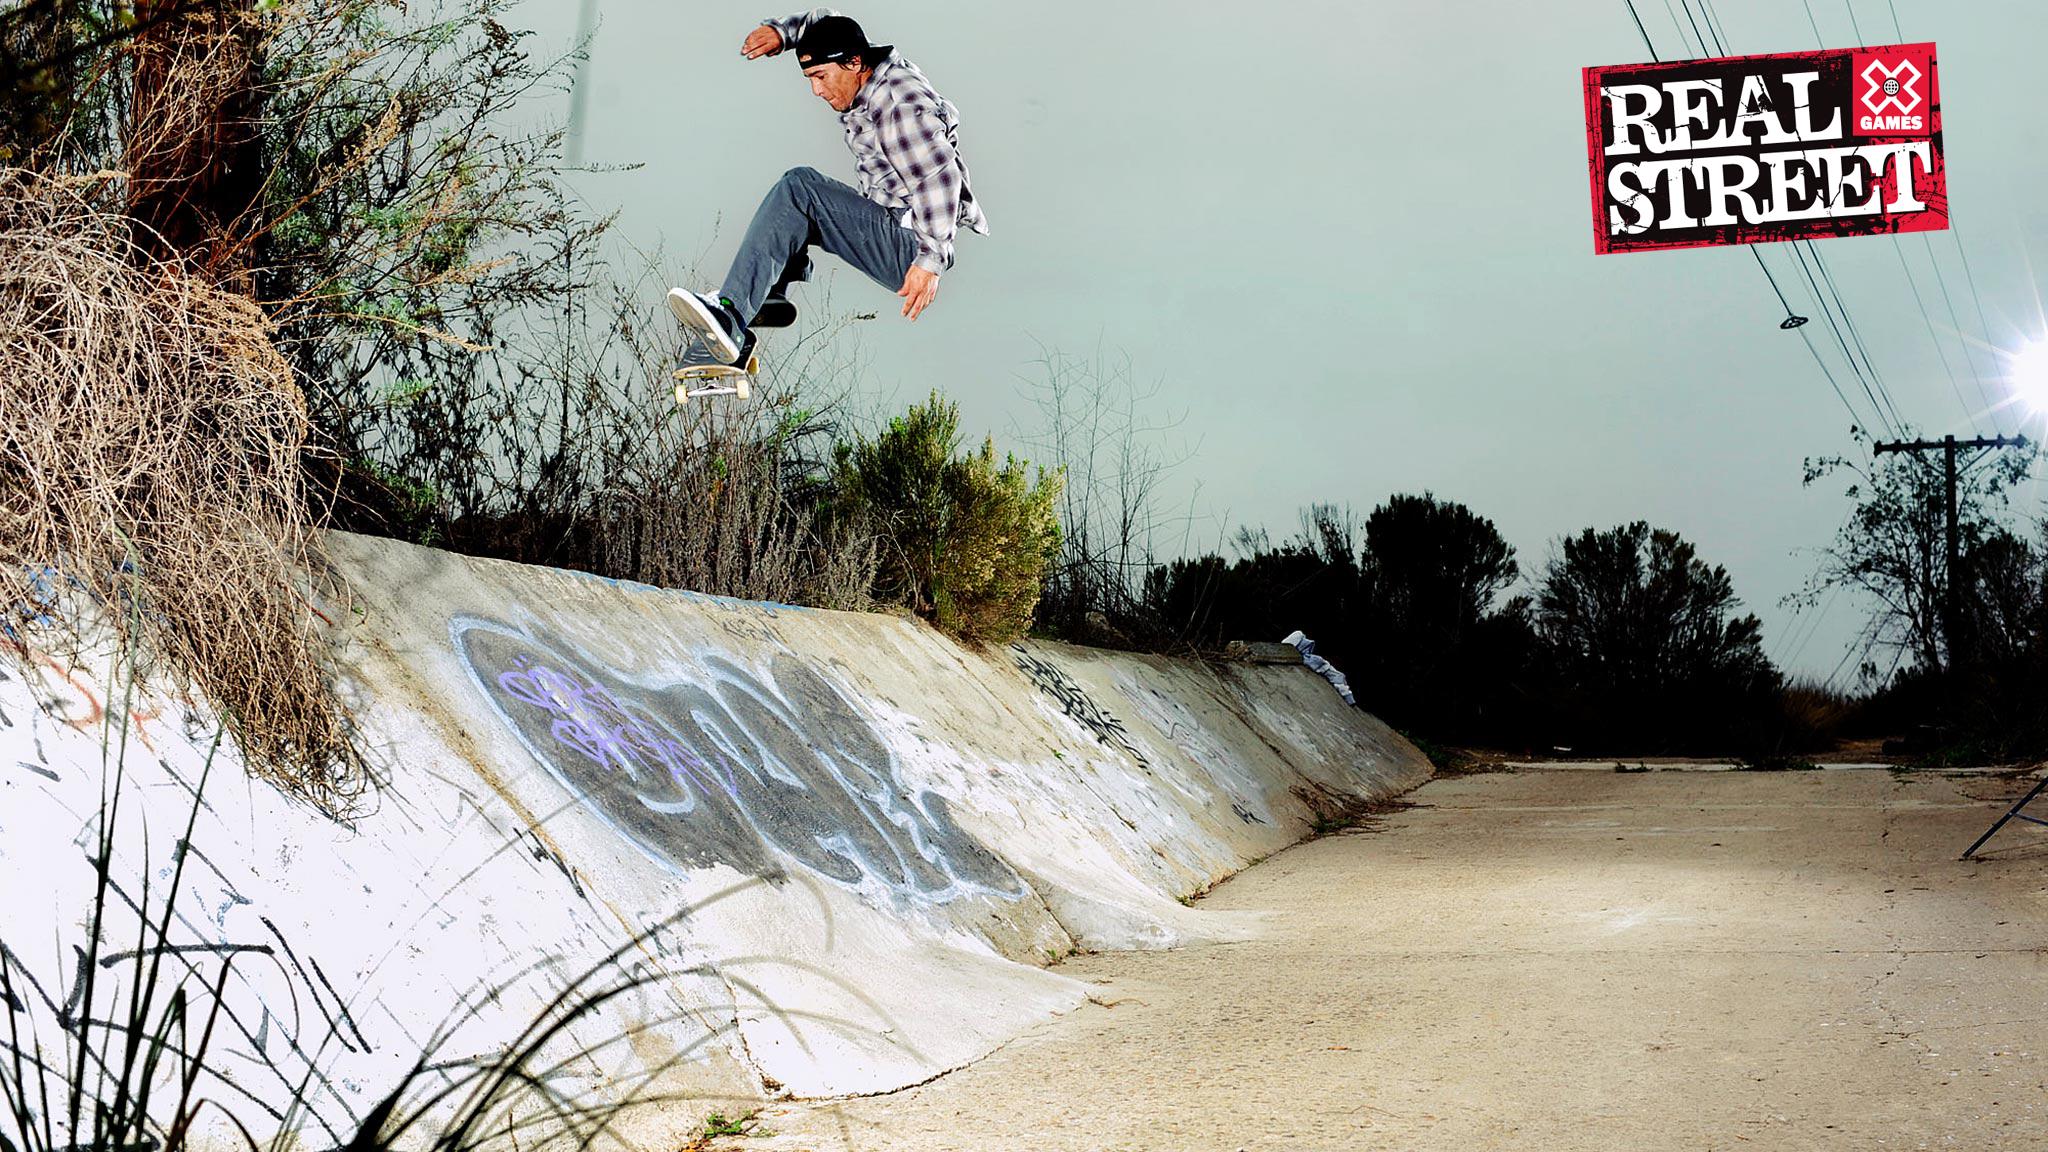 Tony Hawk Donates His First Skateboard To Smithsonian